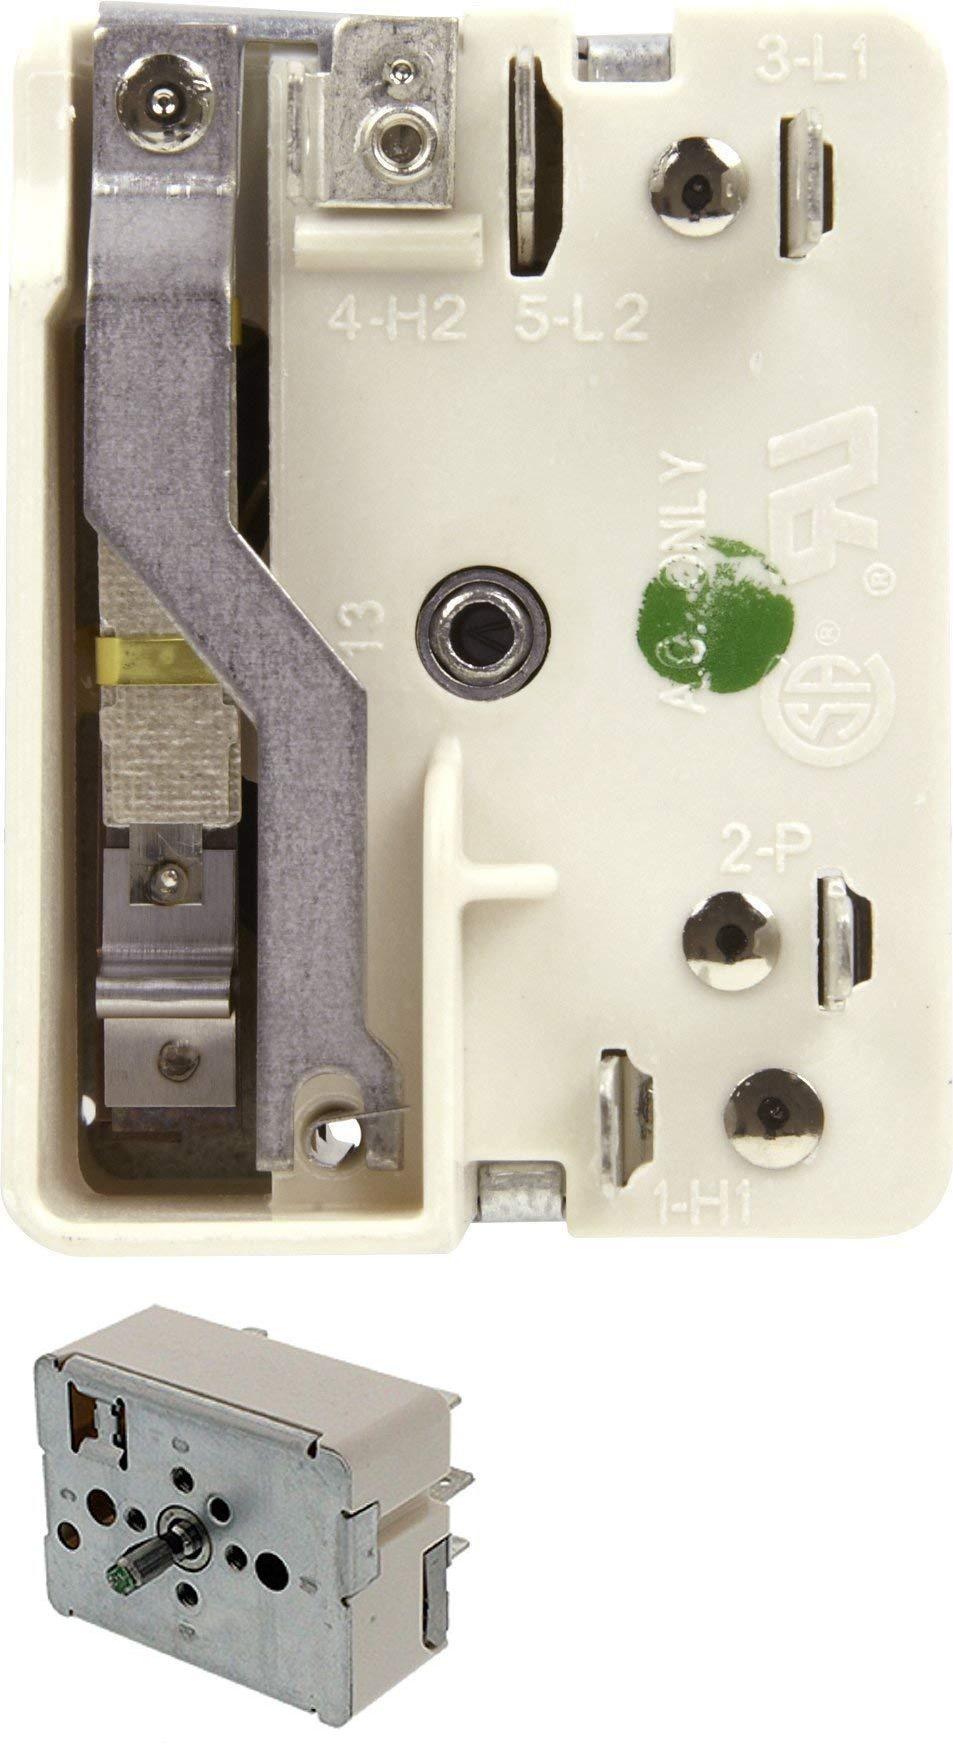 3148953 Whirlpool Range infinite switch AP6007658 PS11740775